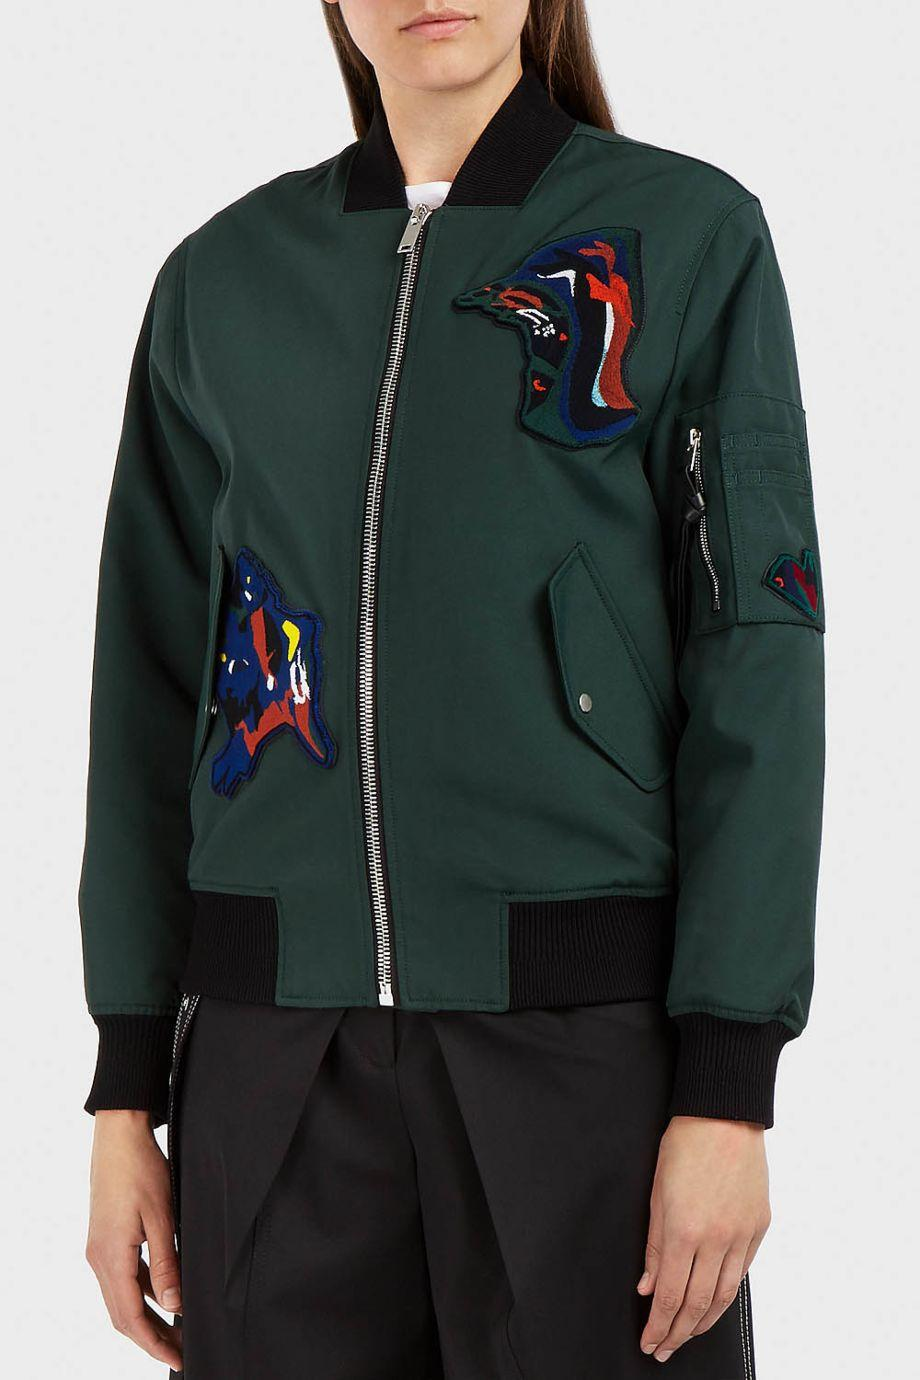 Proenza Schouler  Appliquéd Canvas Bomber Jacket